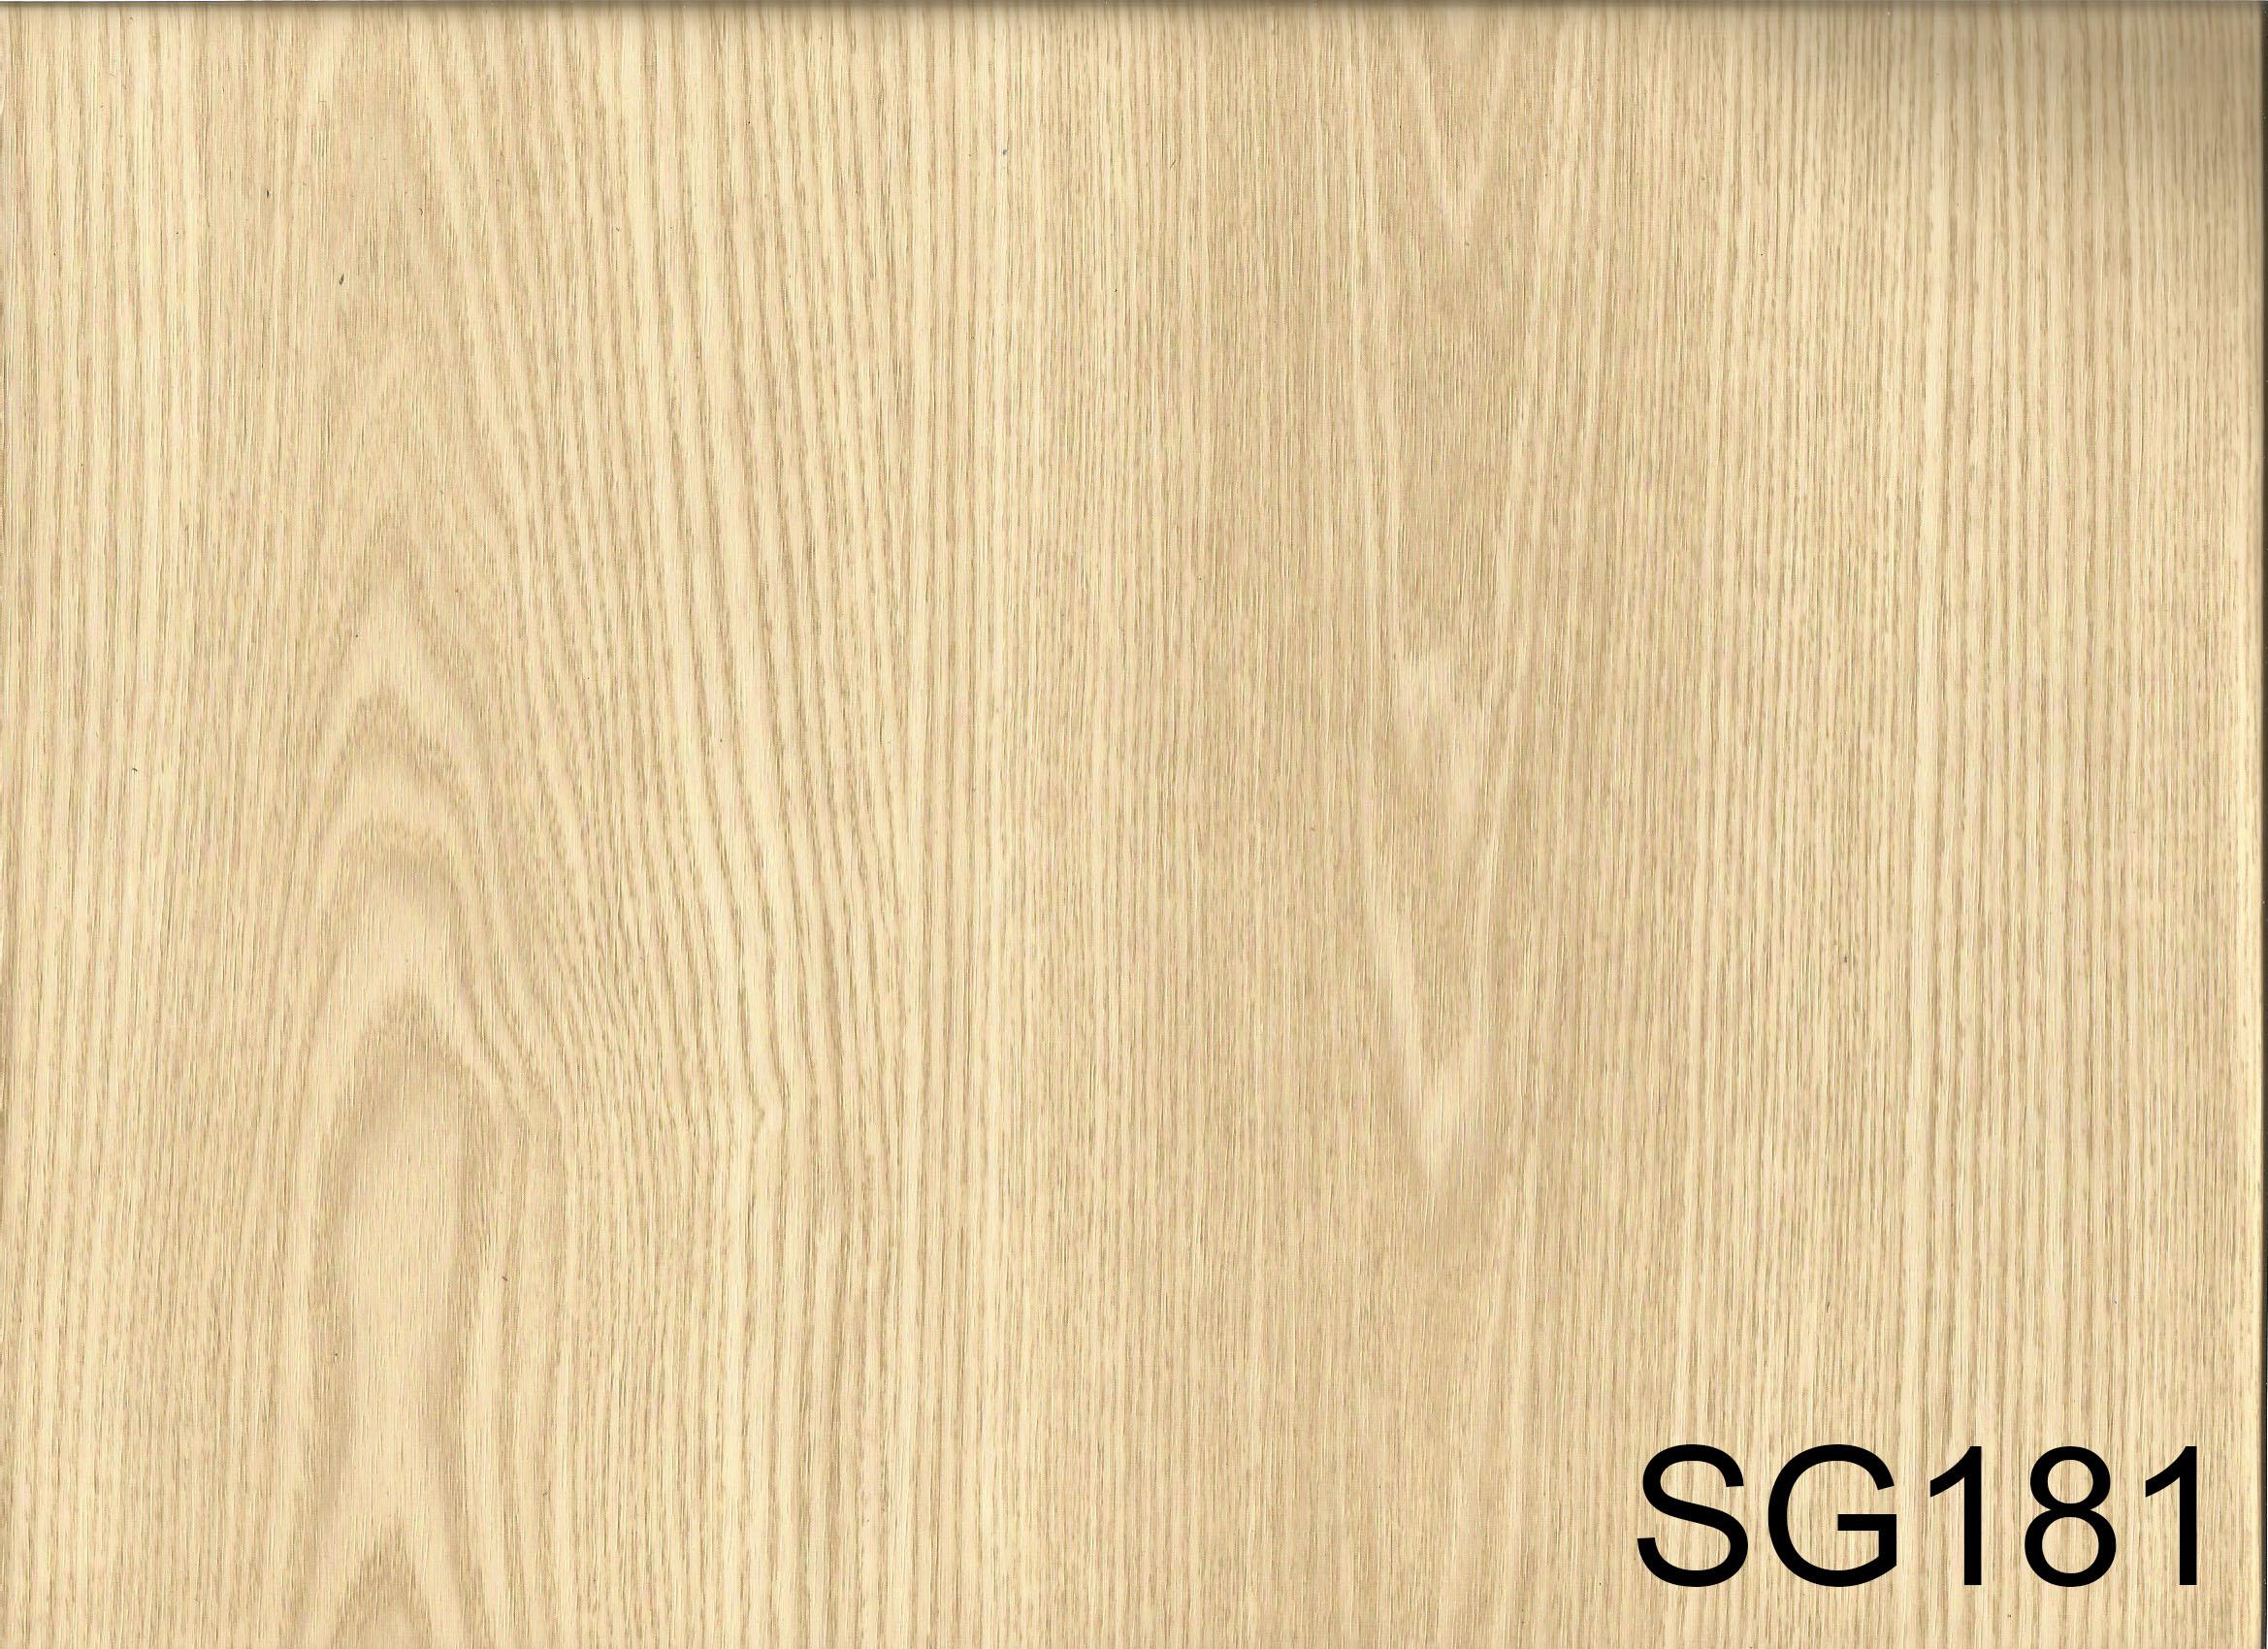 SG181